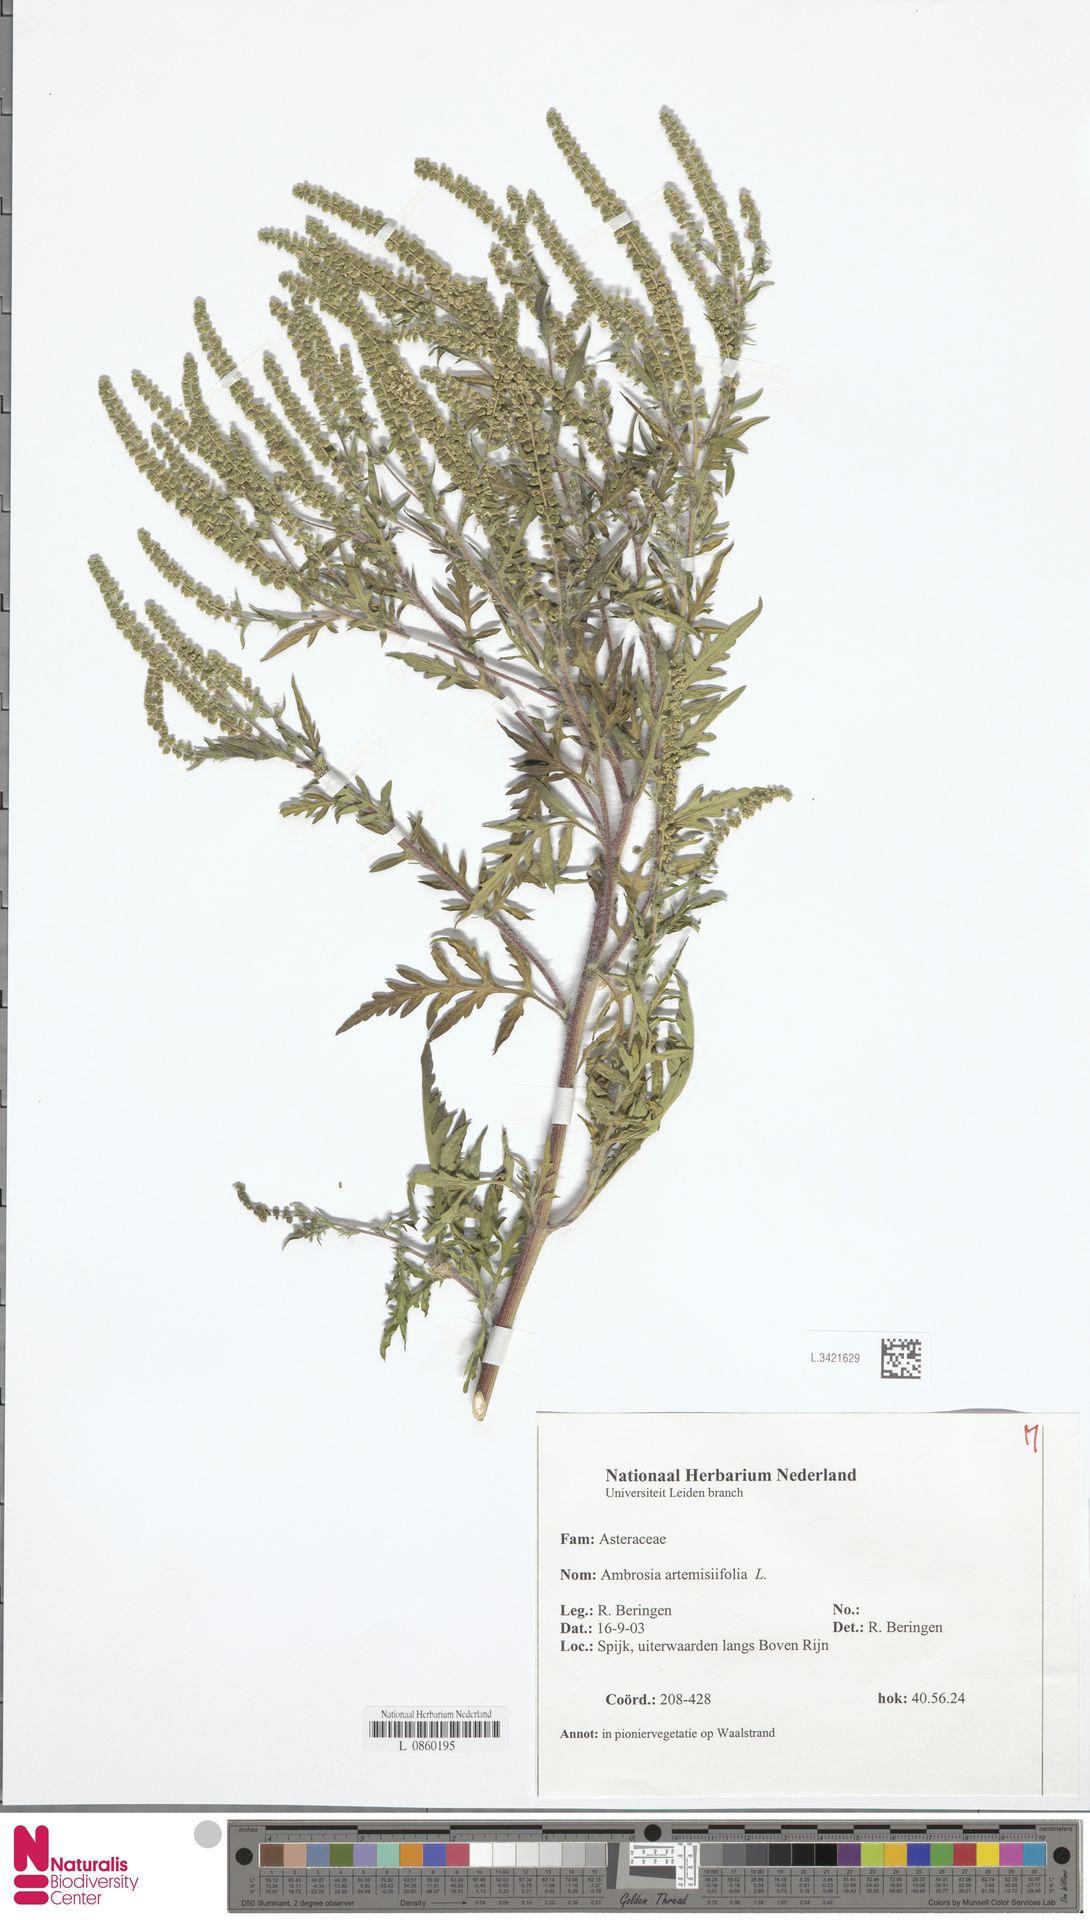 L.3421629   Ambrosia artemisiifolia L.